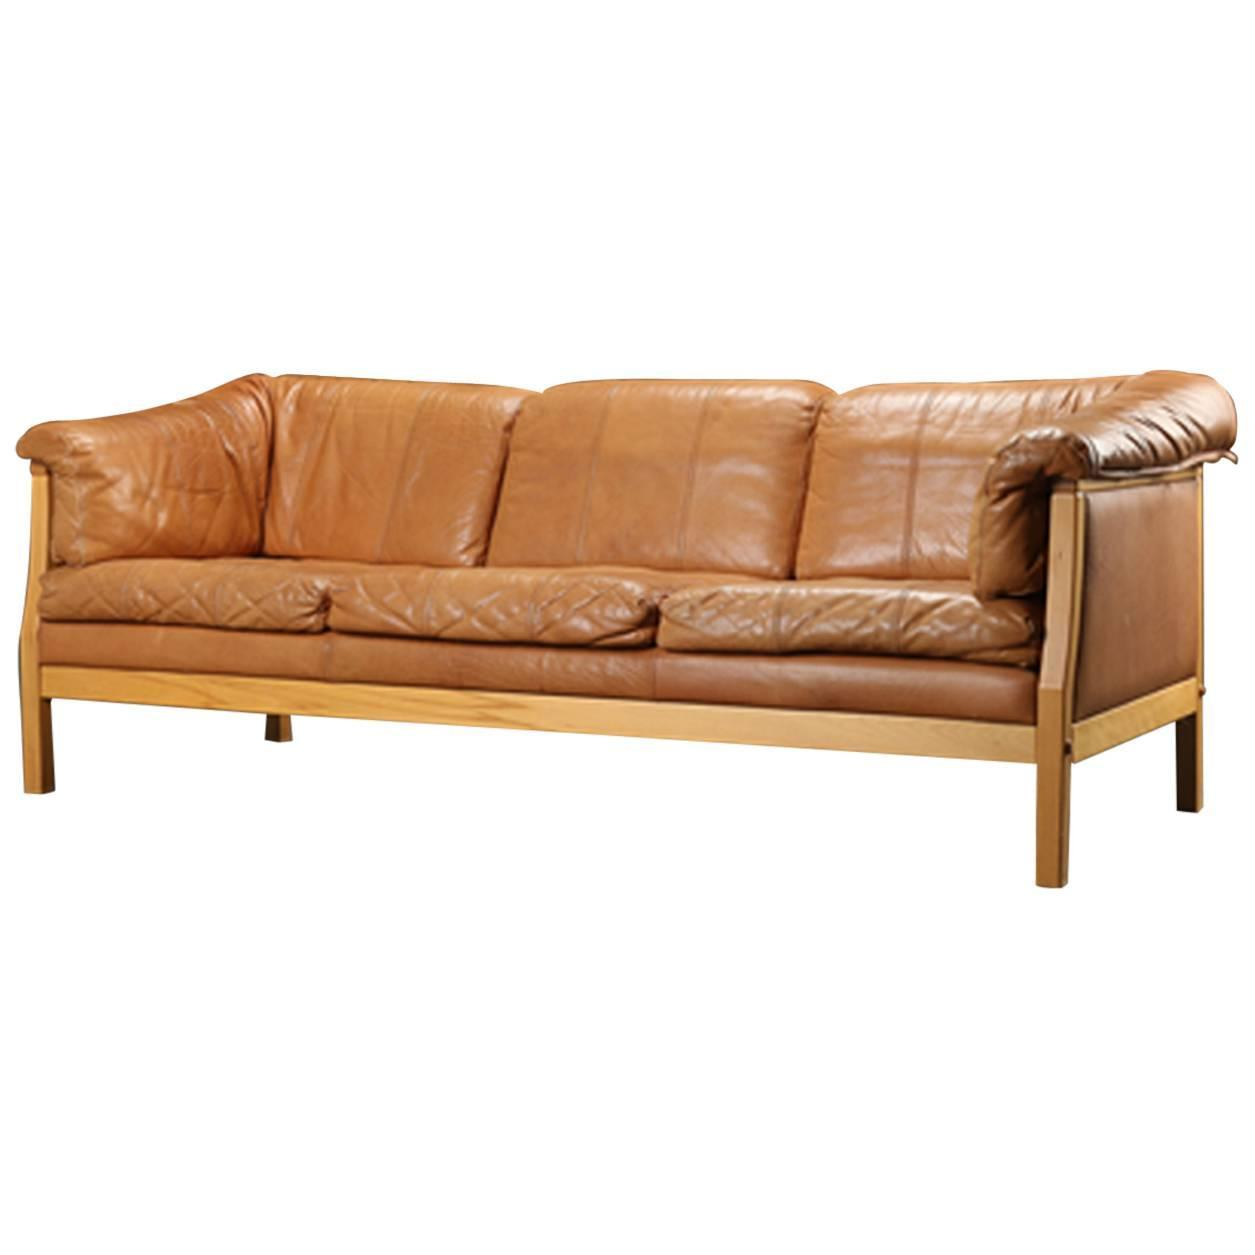 danish modern caramel leather sofa at 1stdibs